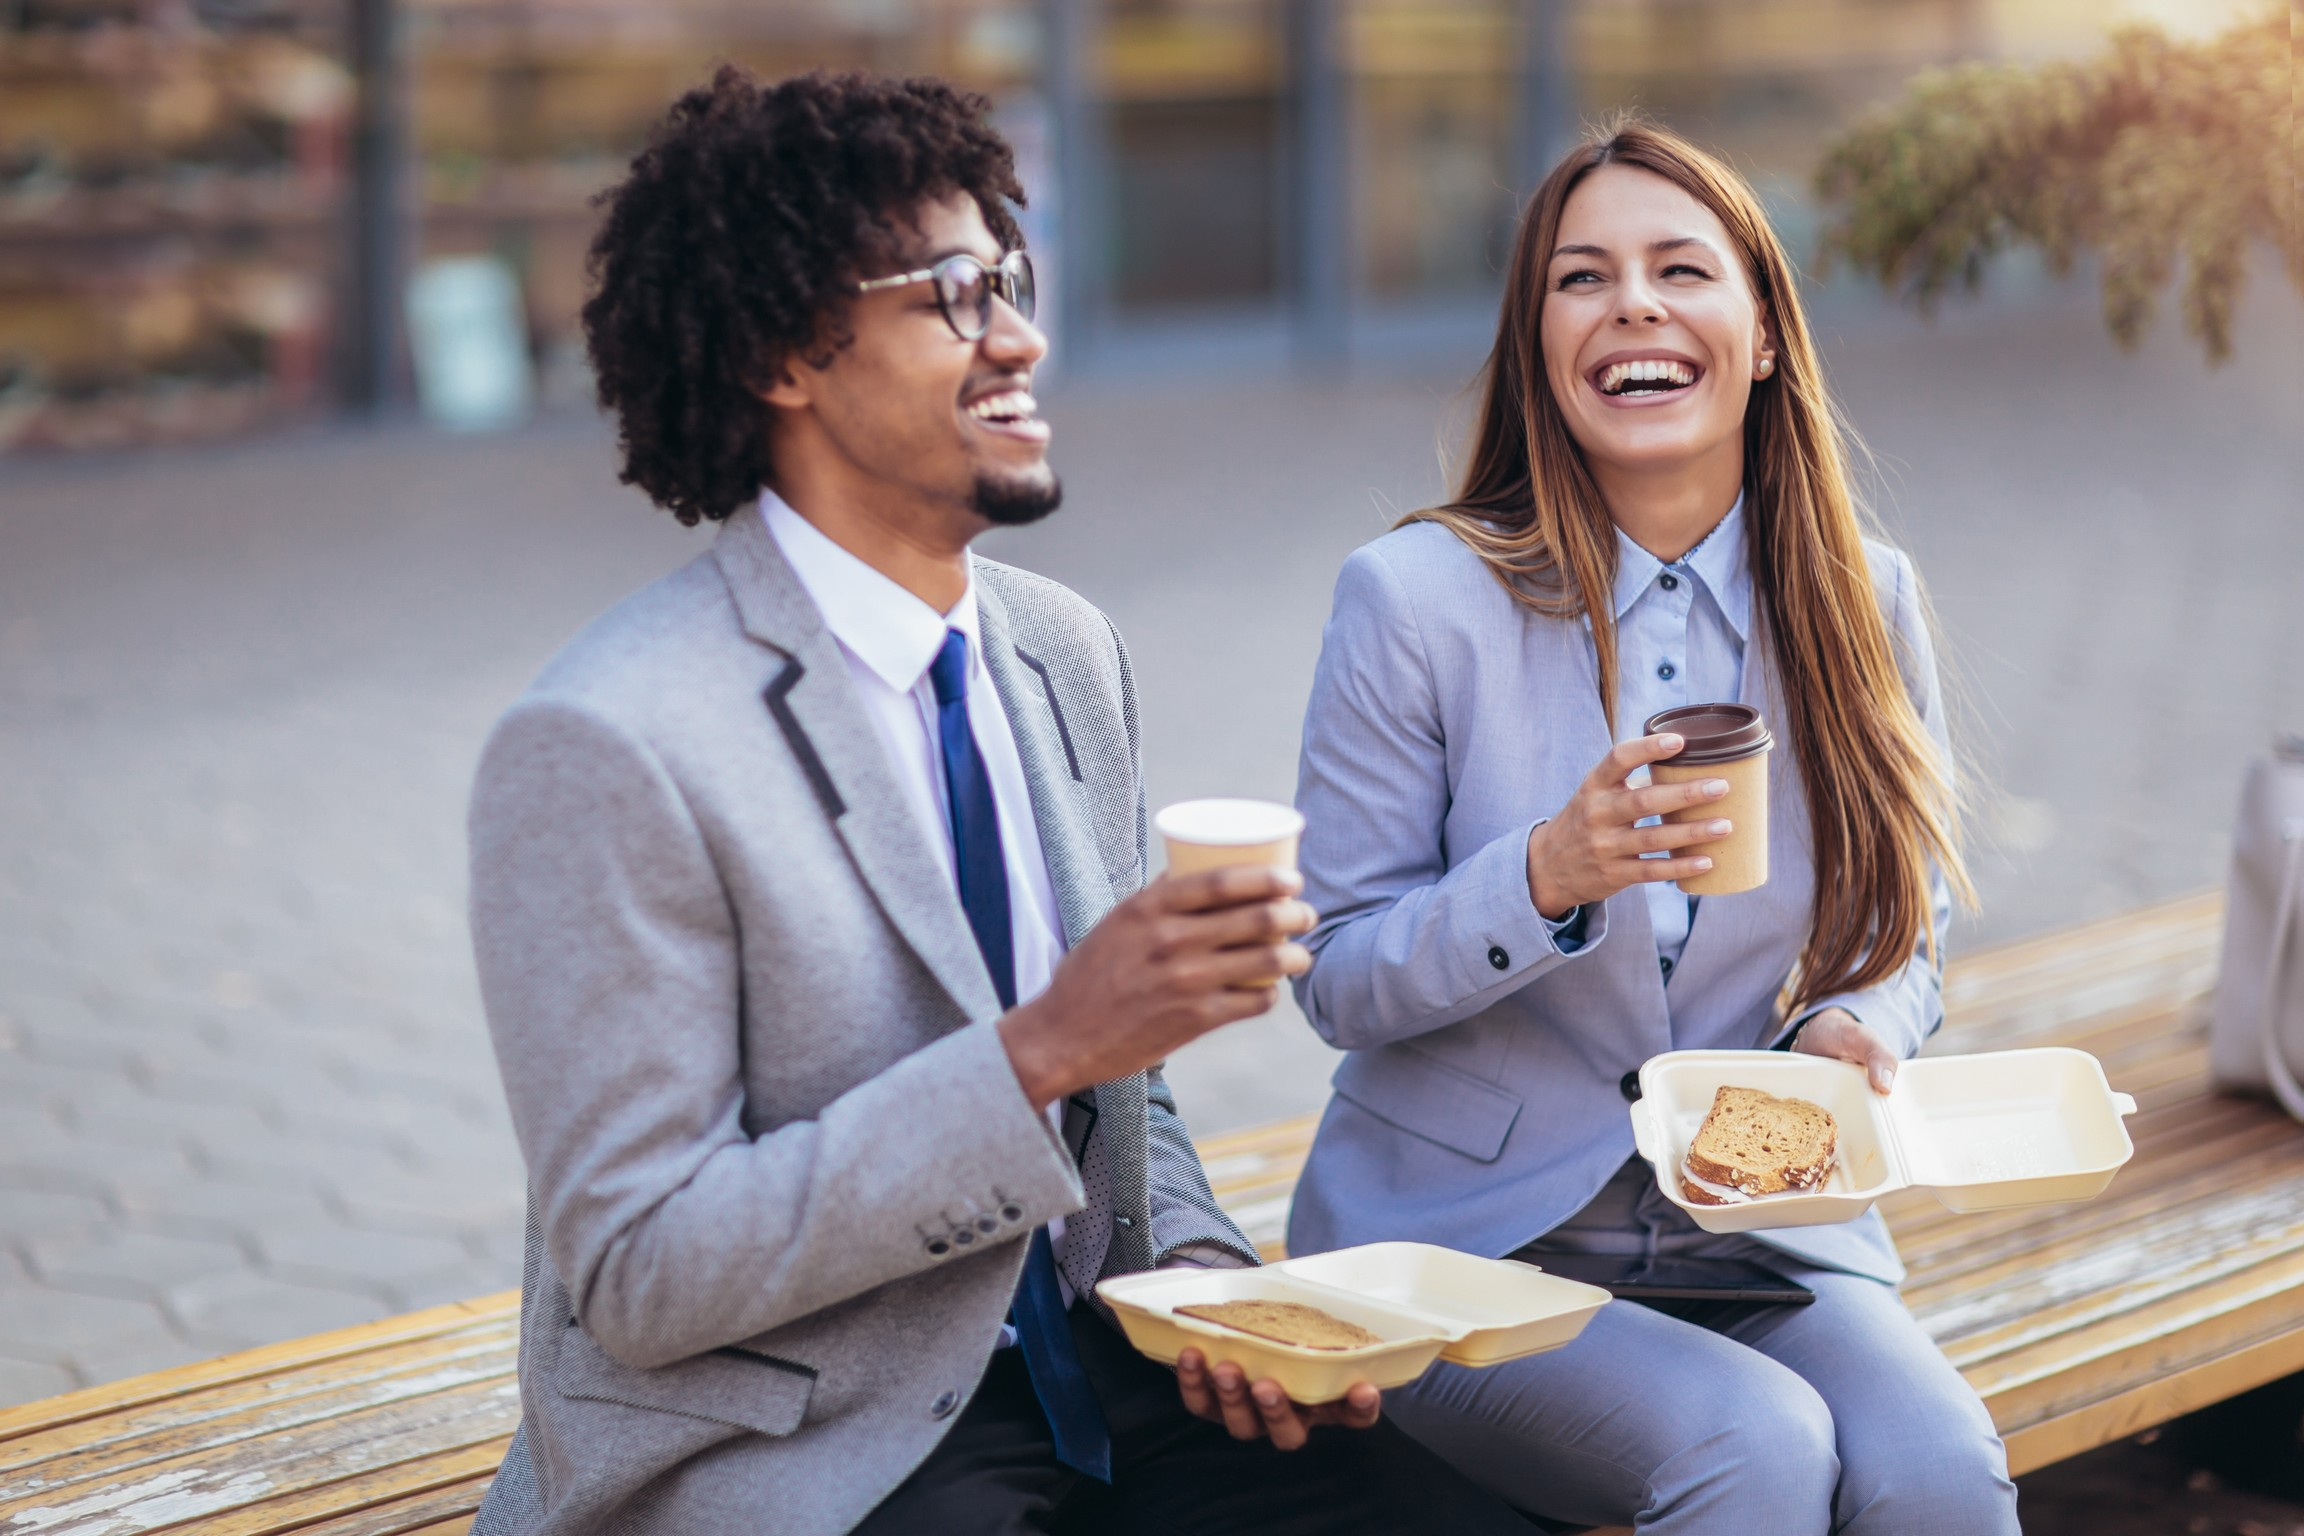 Phoenix Office Coffee | Employee Benefit | Refreshment Services